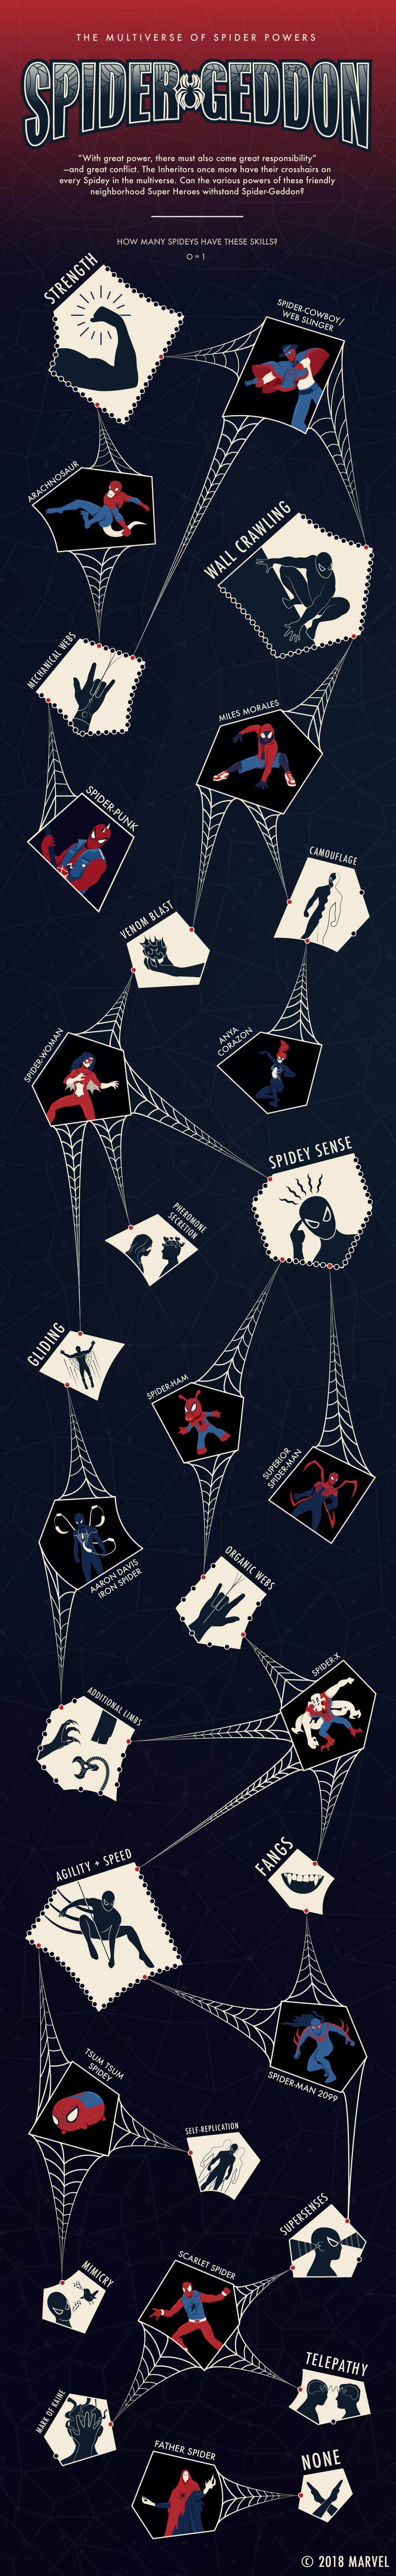 The Multi-Verse of Spider Powers in Spider-Geddon